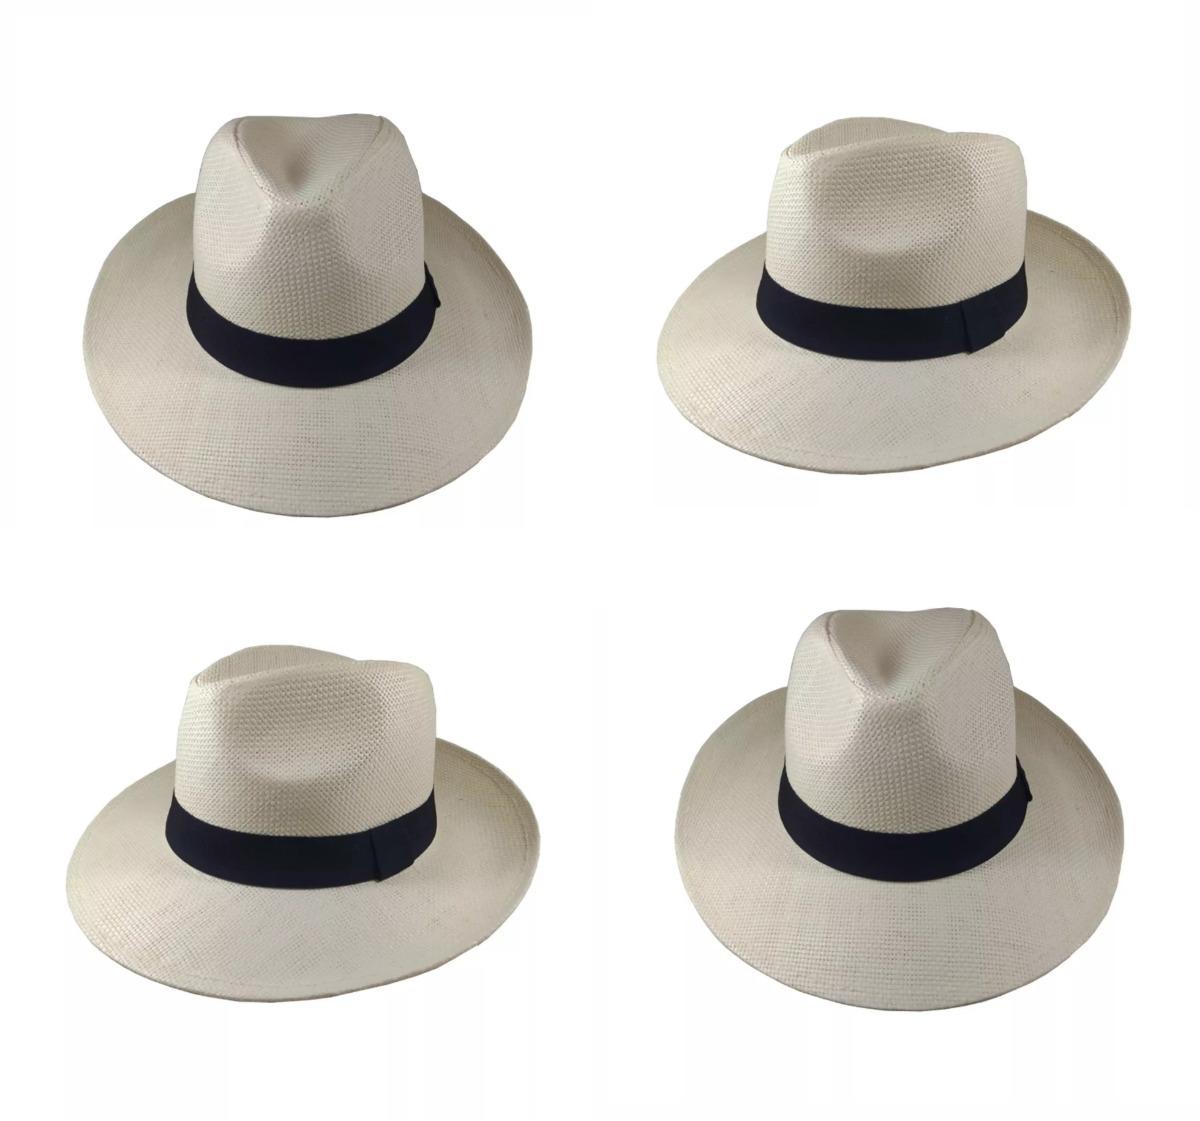 Chapéu Moda Panamá Aba Larga Clássico Masculino Feminino - R  25 65d7a2ac882